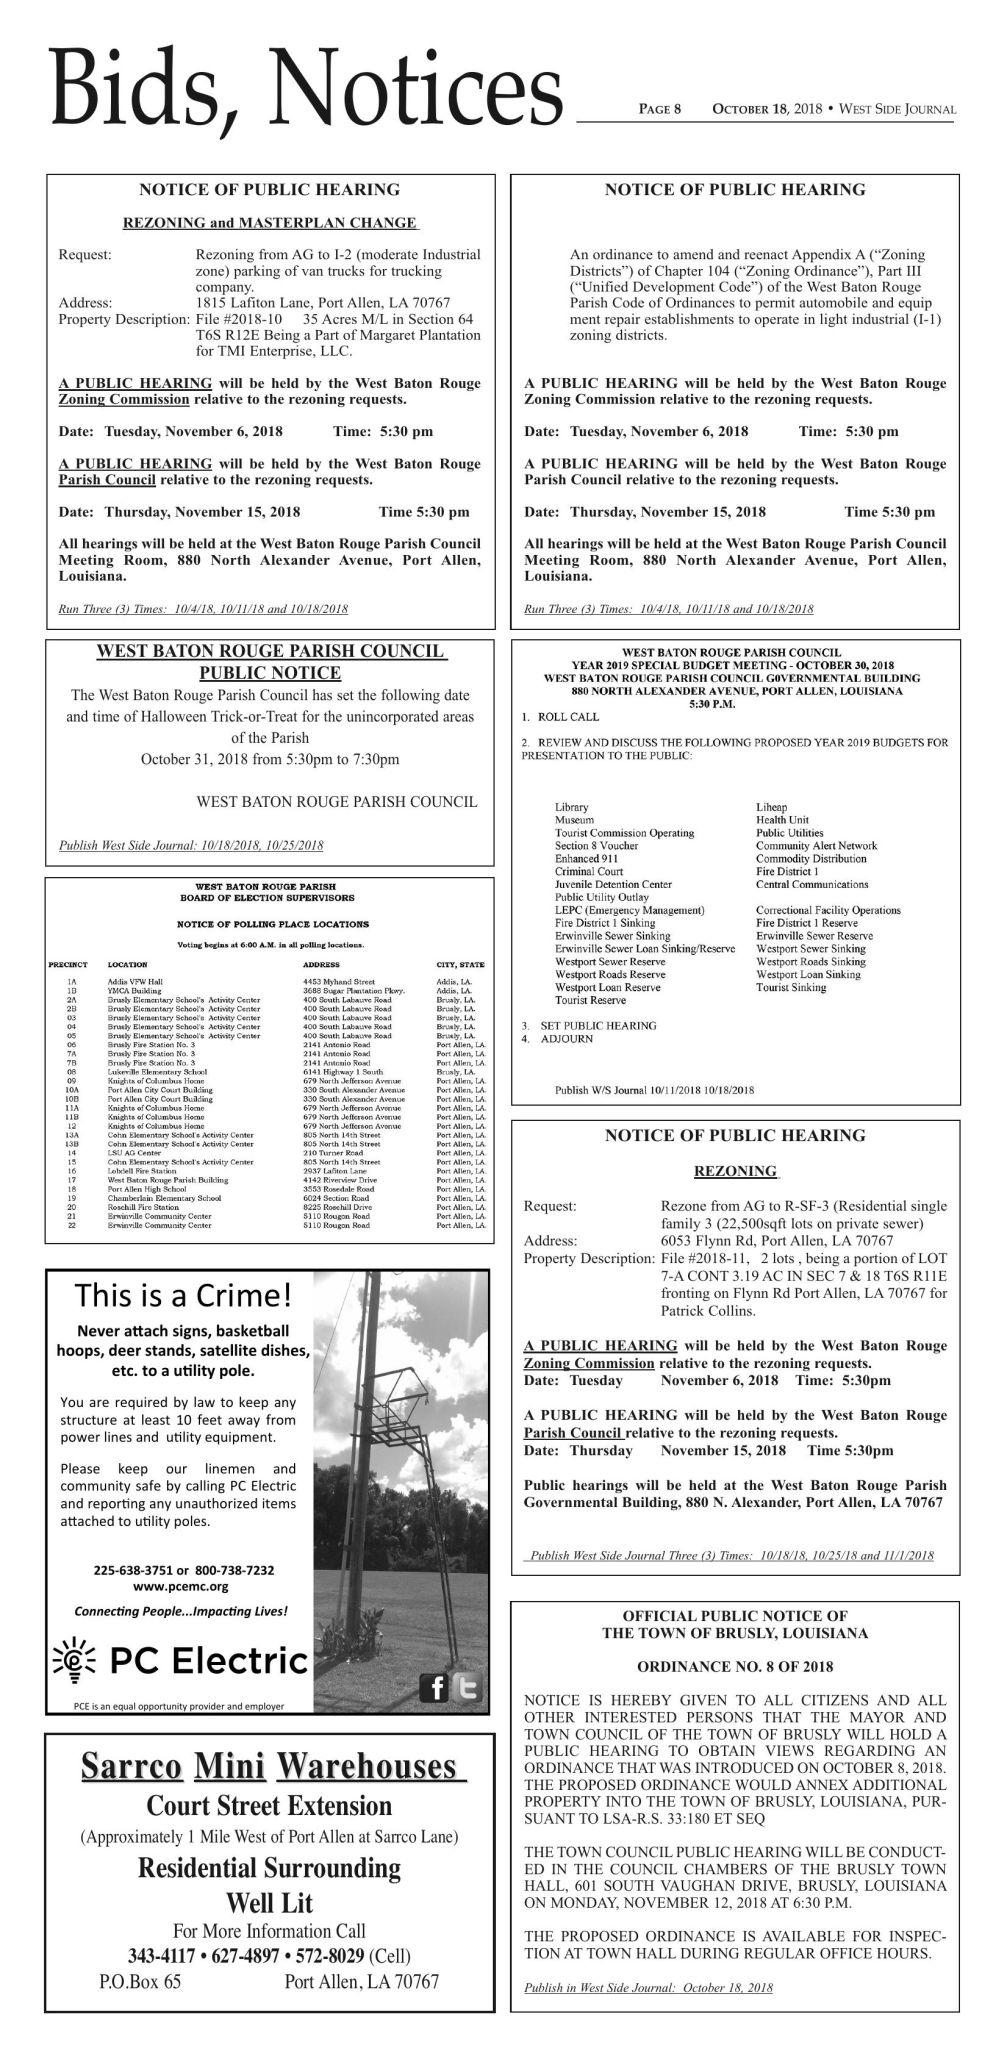 Bids & Notices 10/18/18